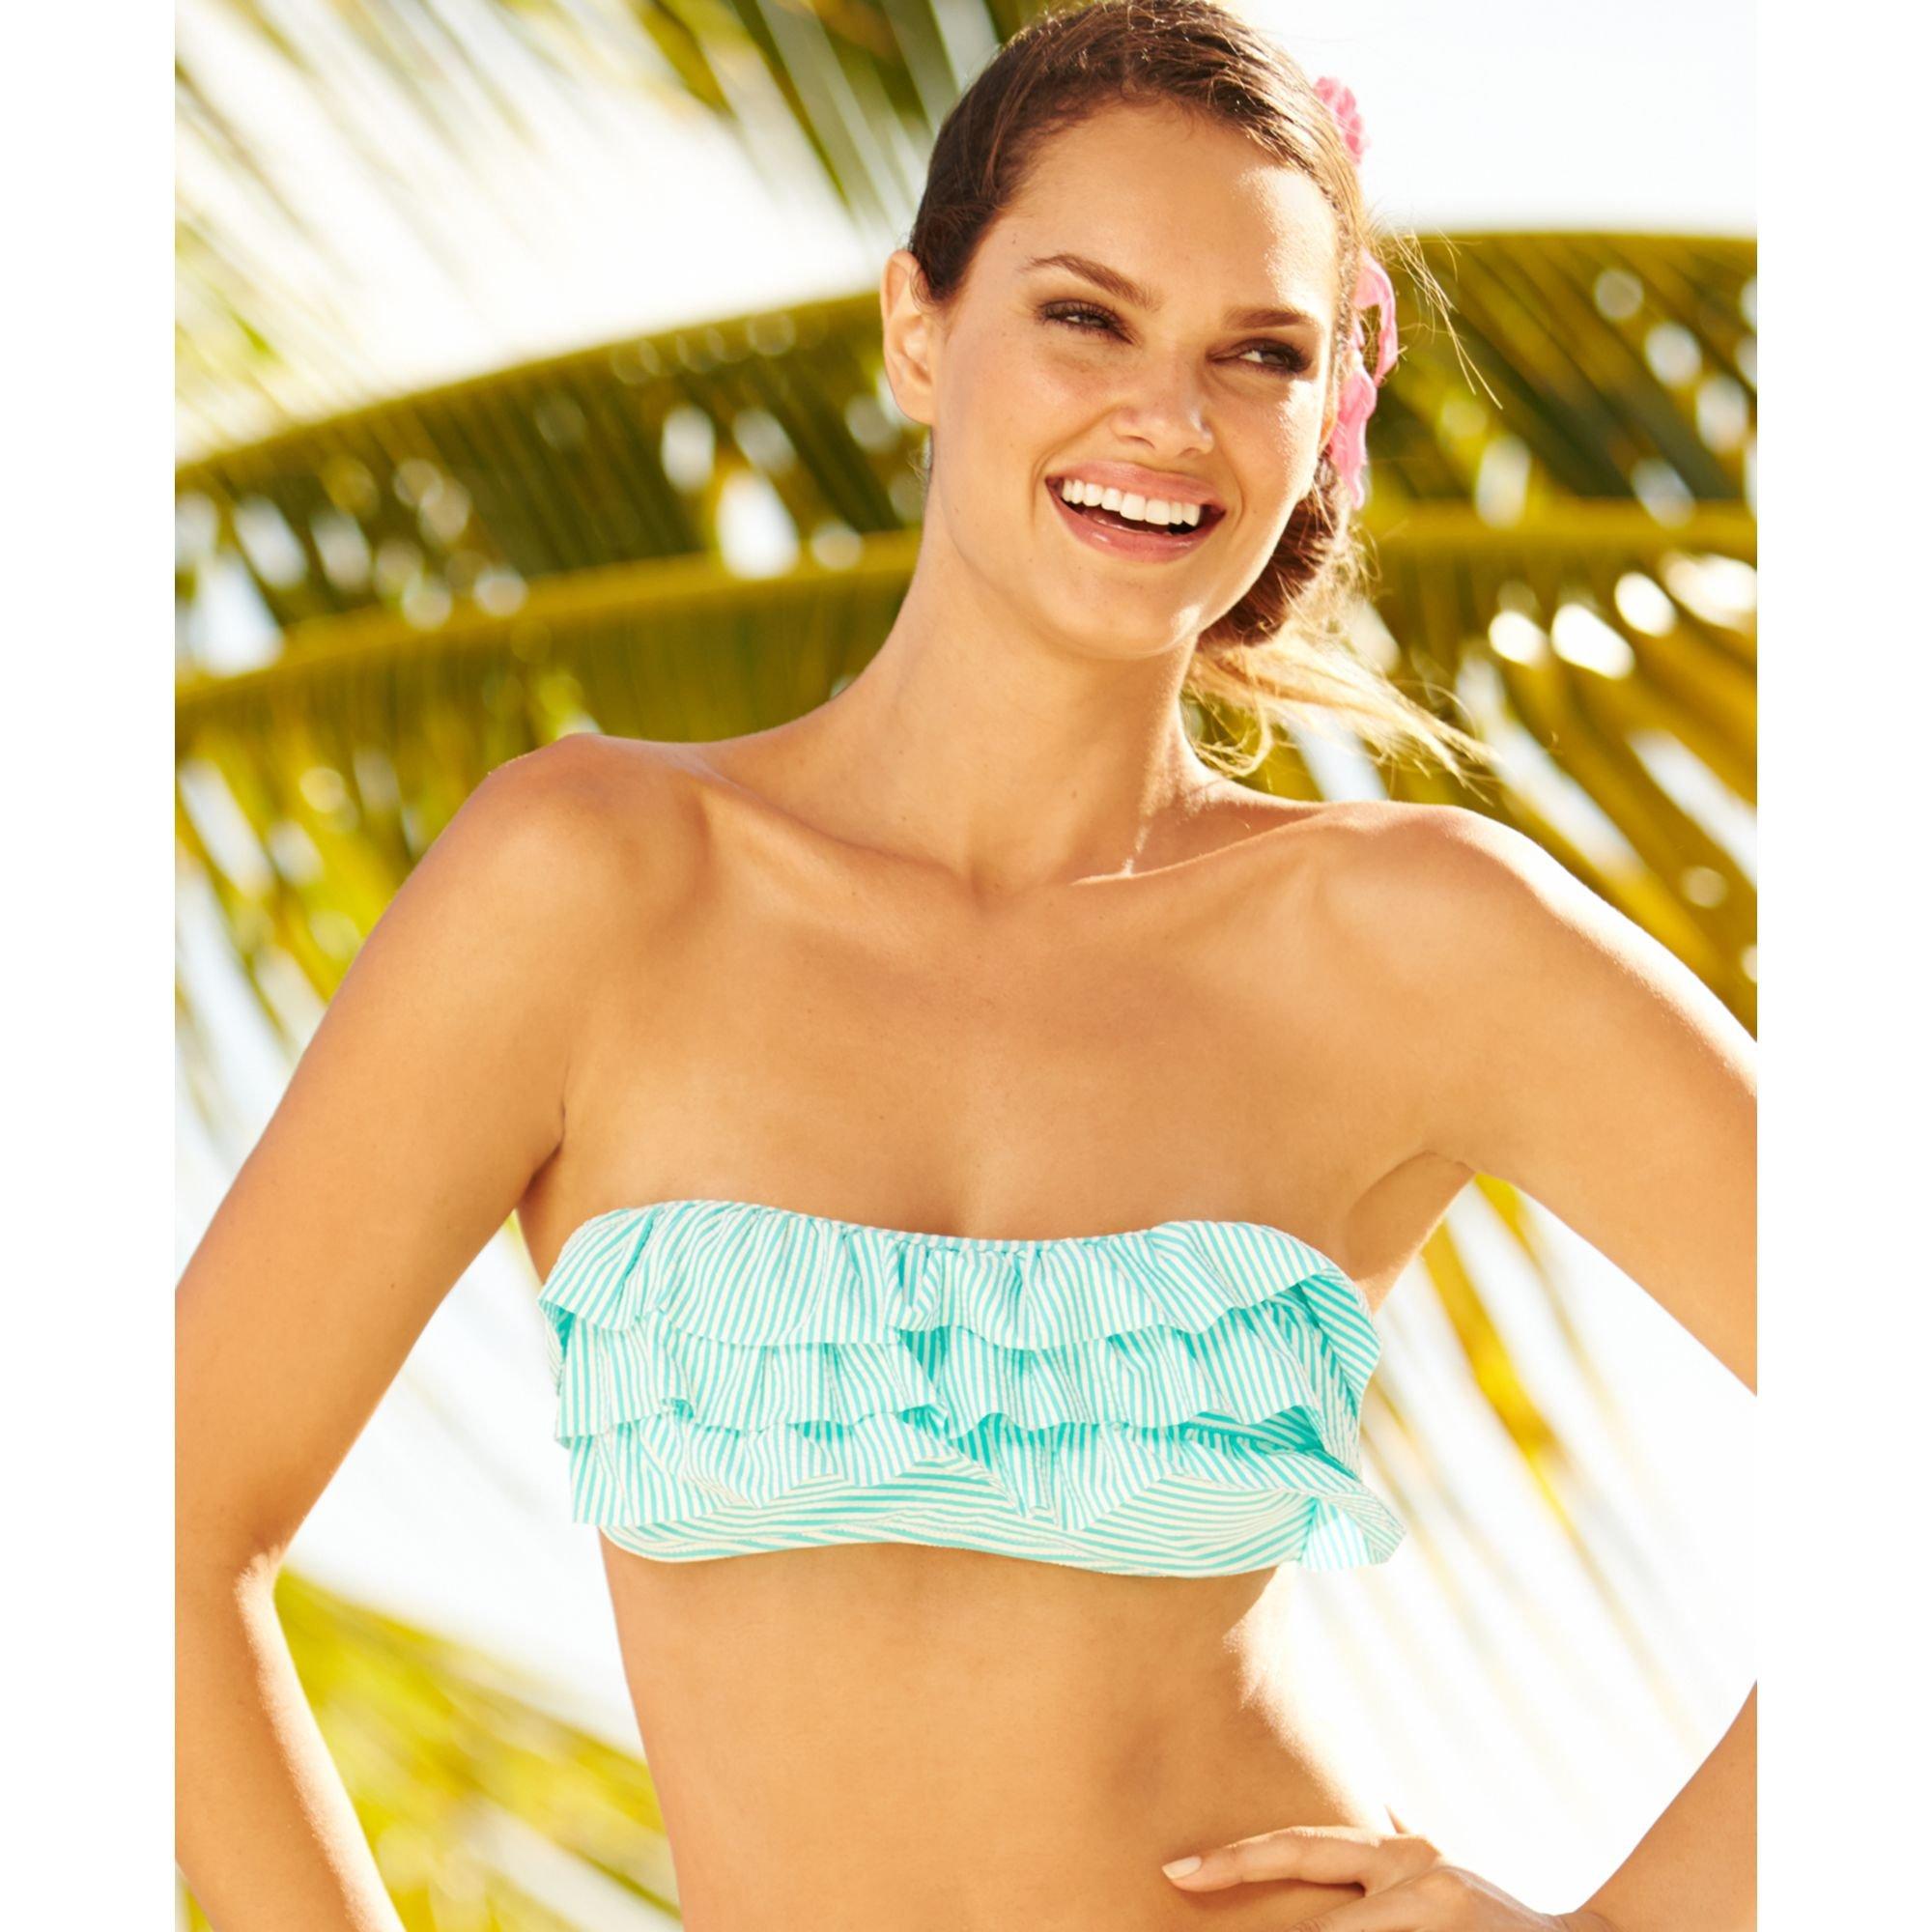 ce6993ec03e Lyst - Jessica Simpson Seersucker Ruffle Bandeau Bikini Top in Blue